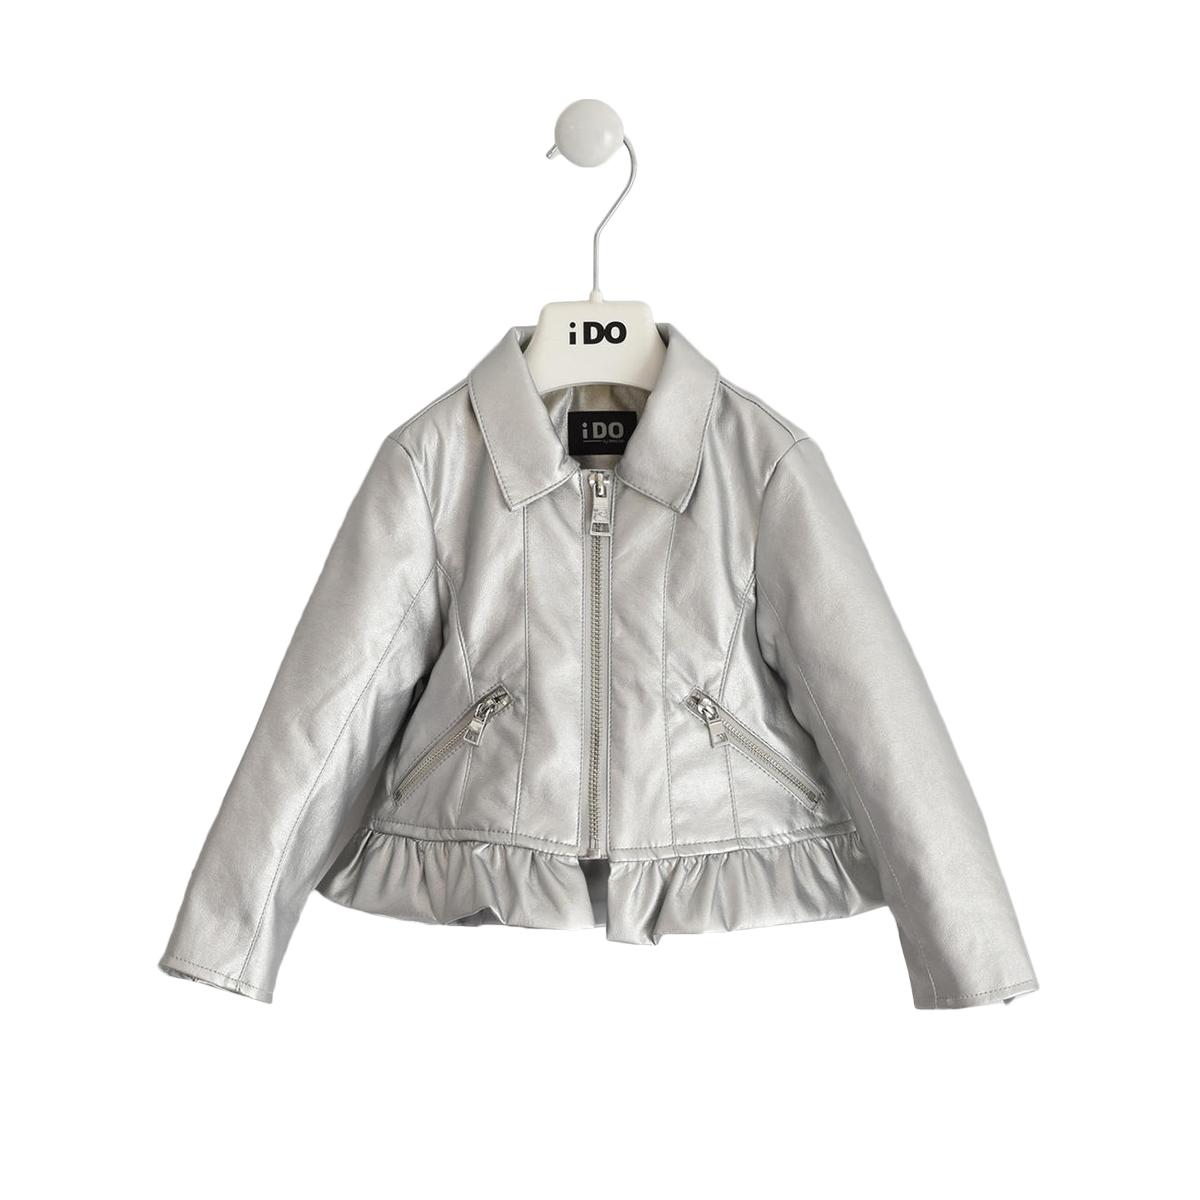 iDO jakna eko koža J355, 2-6